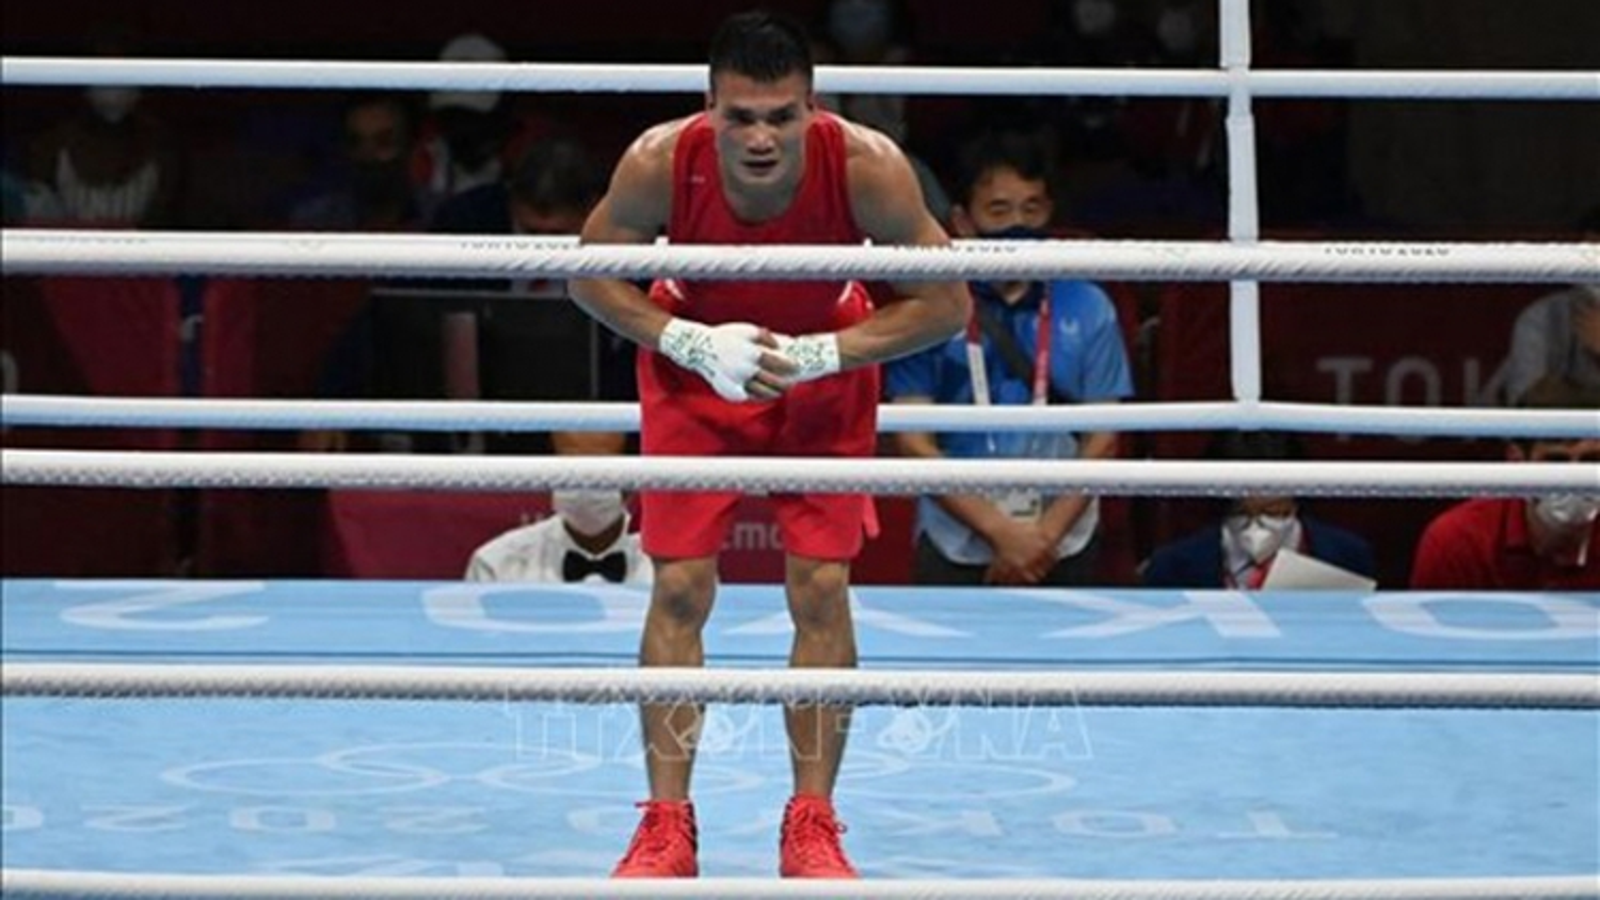 Vietnamese boxer loses to Mongolian rival at Tokyo 2020 Olympics